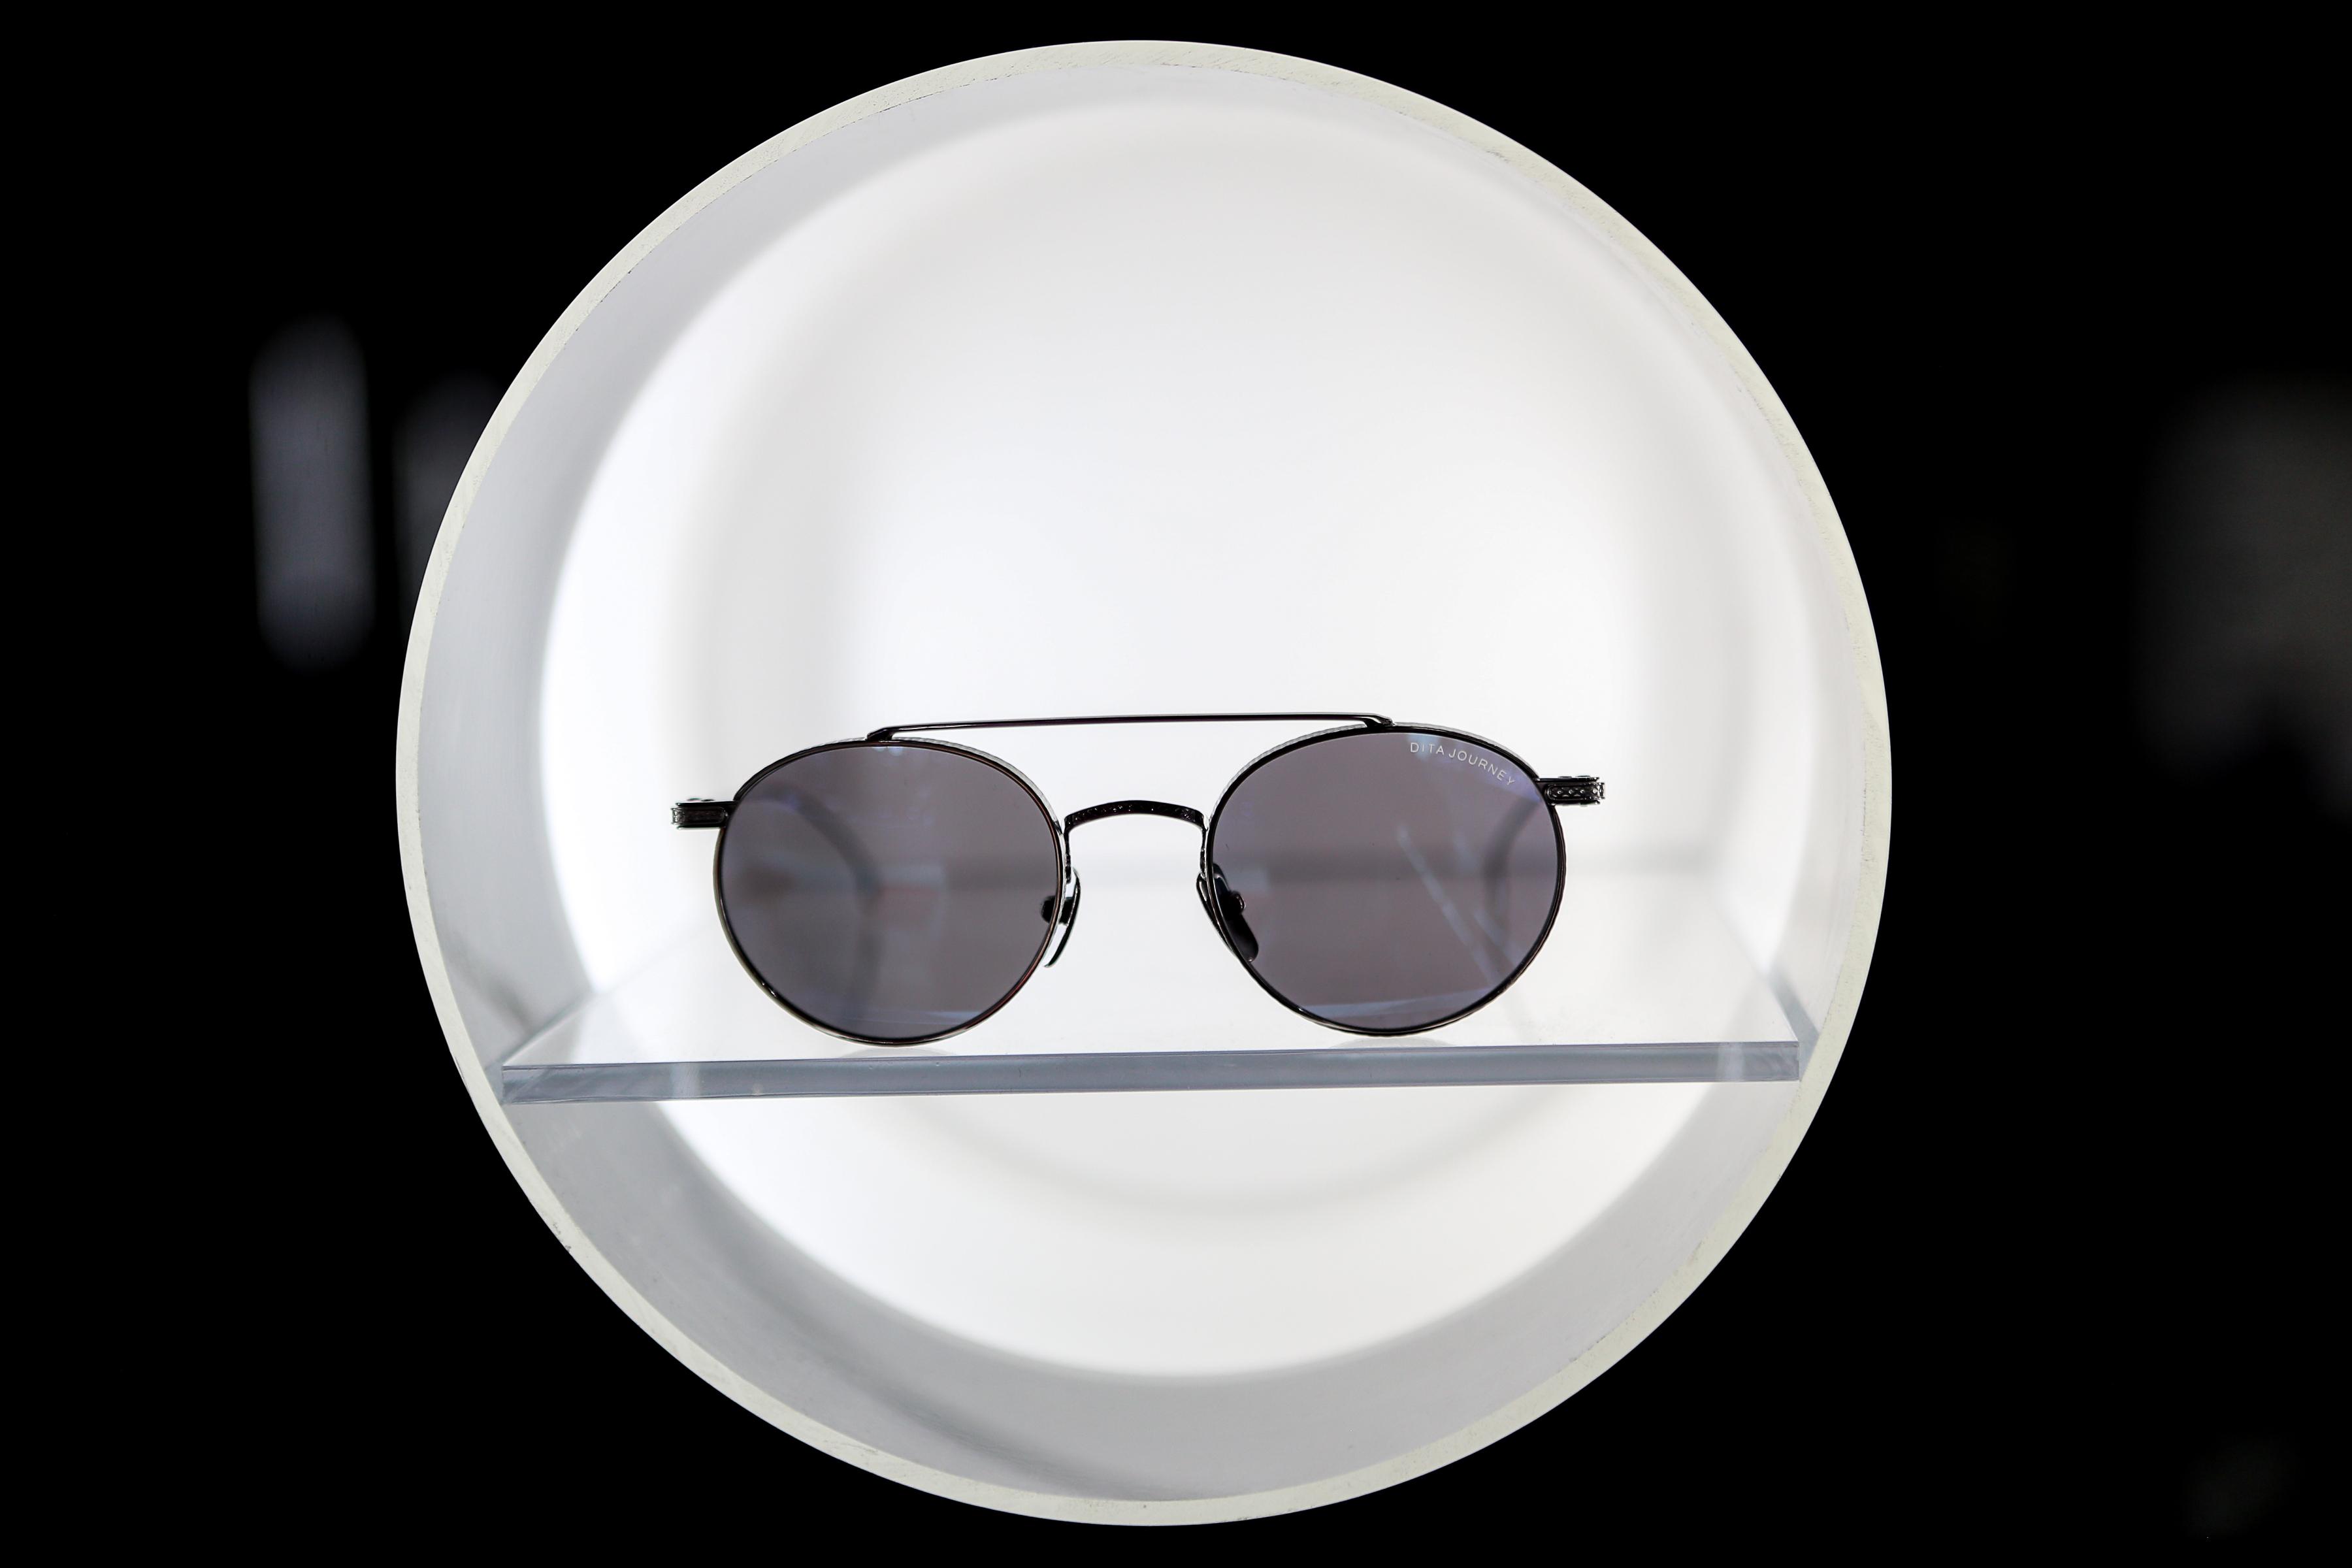 eyeglasses in fashion  eyeglasses trends in